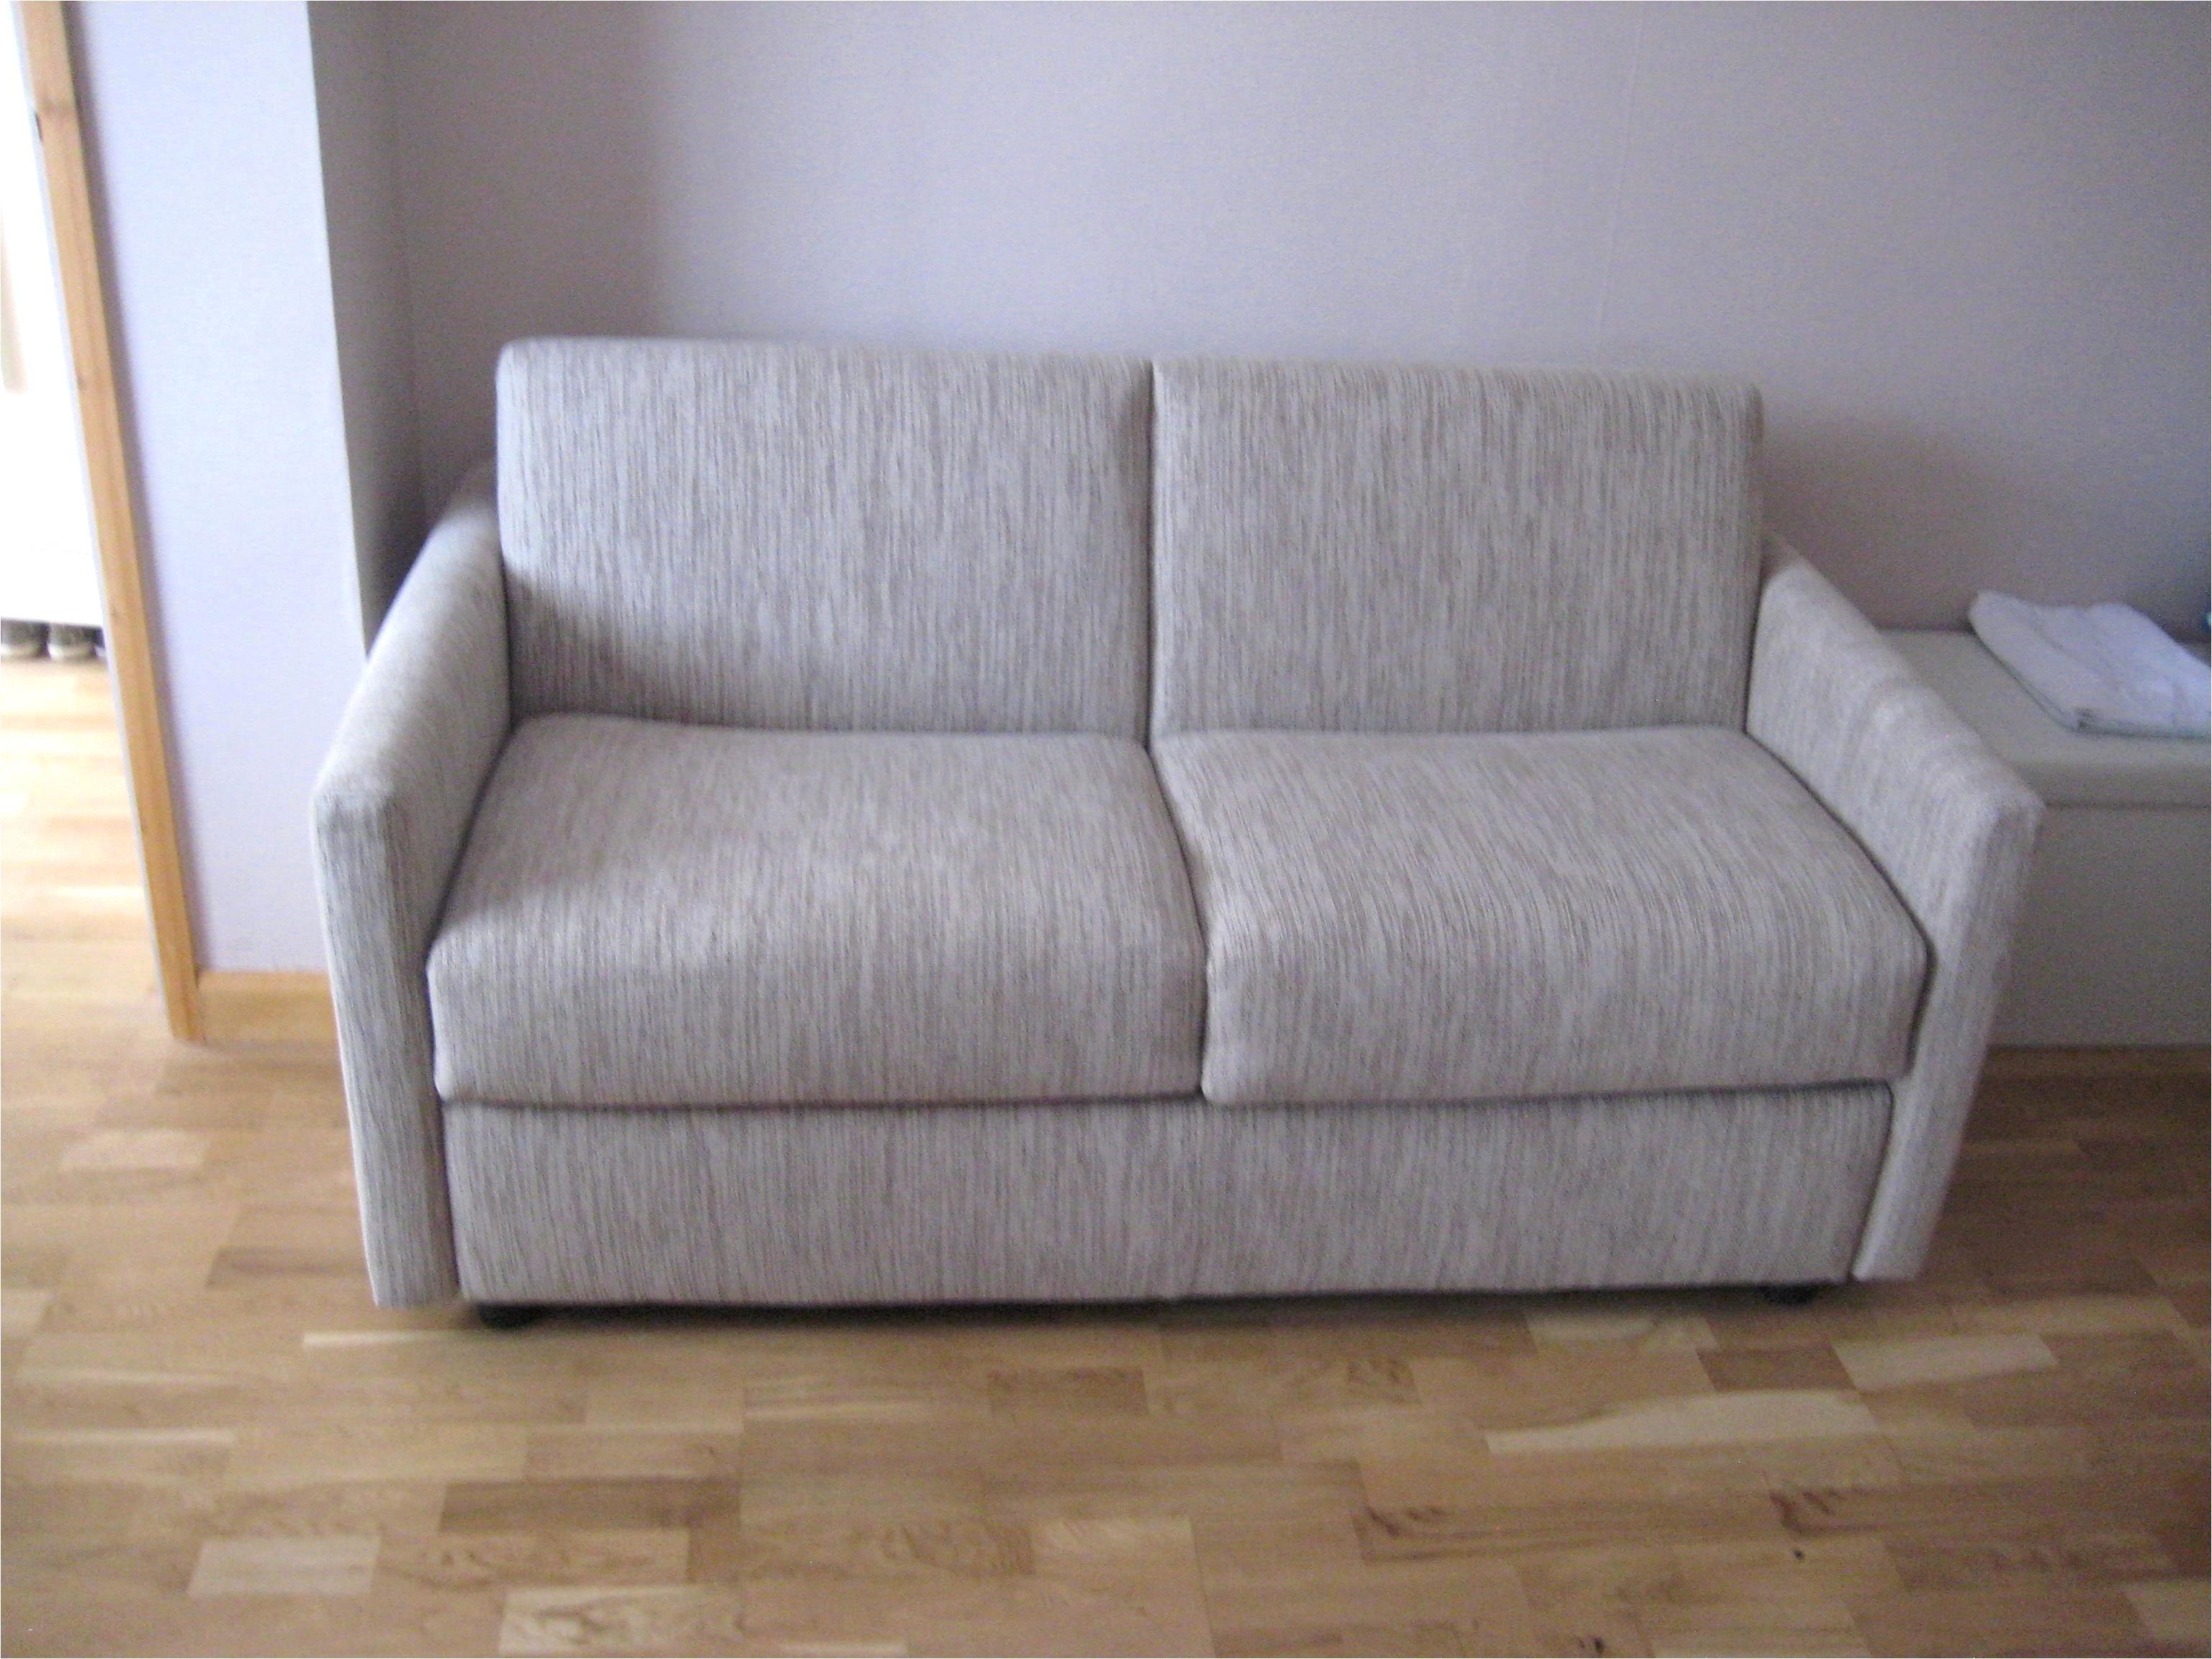 Dark Blue Sectionals Inspiration 50 Unique Blue Sectional sofa Graphics 50 s Home Improvement